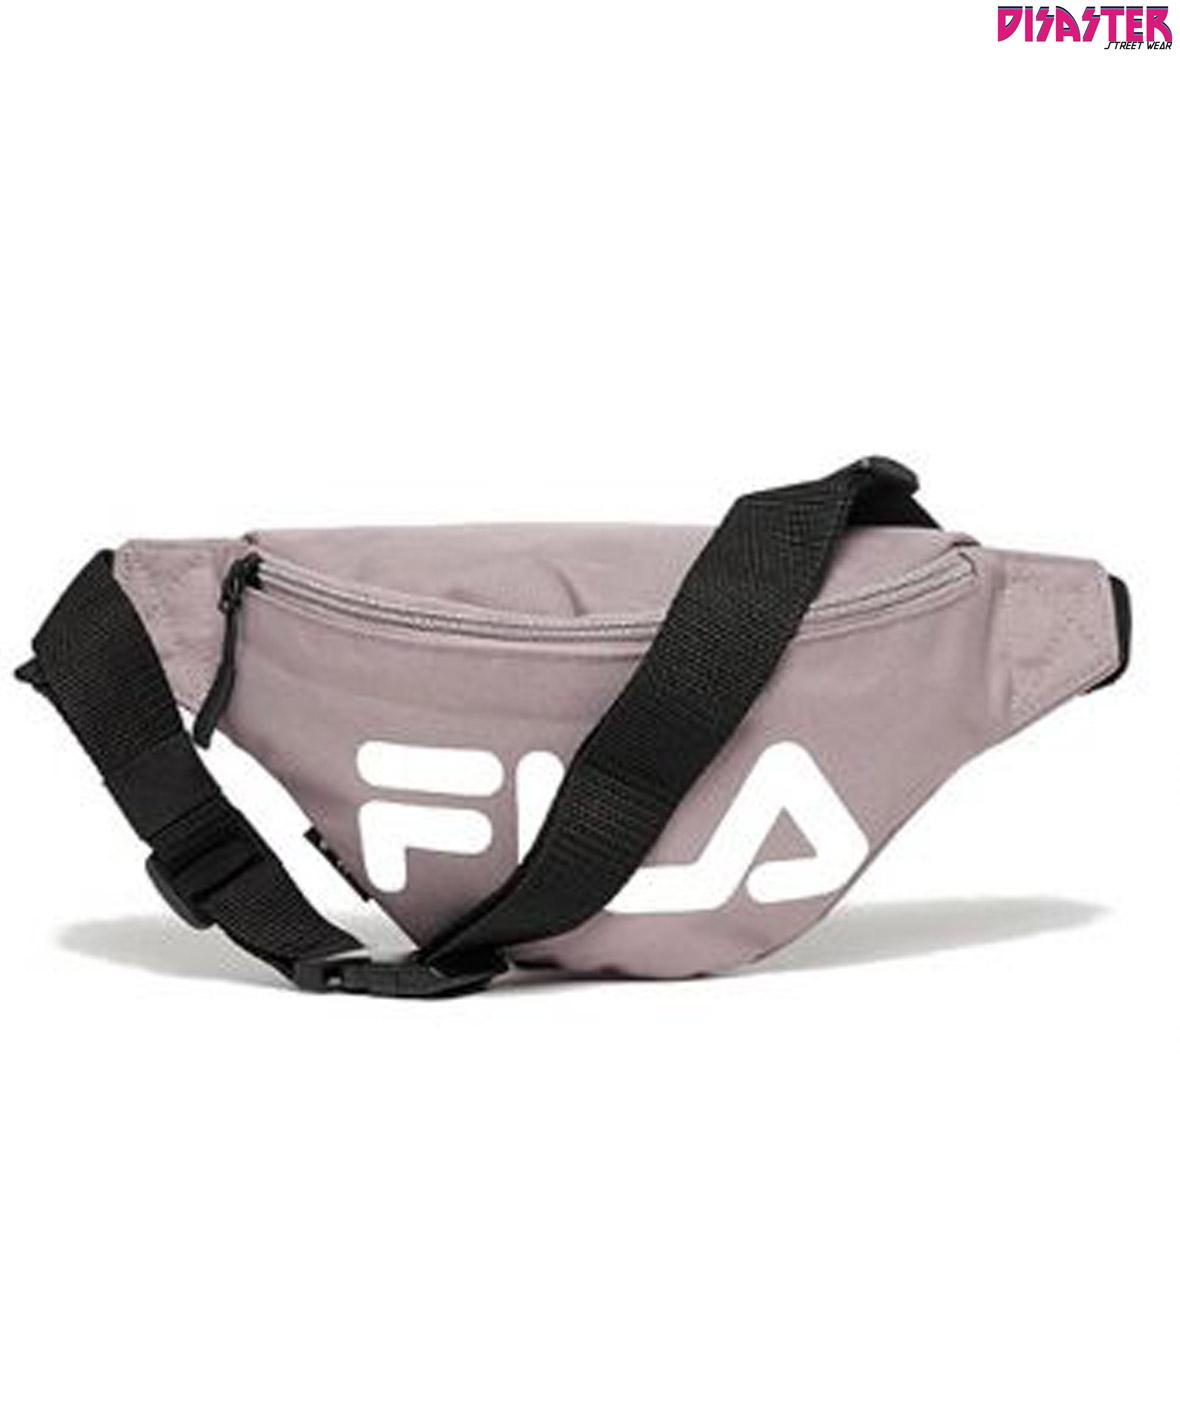 186ae971302f2 Riñonera-FILA-Purple-Dove-disaster-street-wear-01